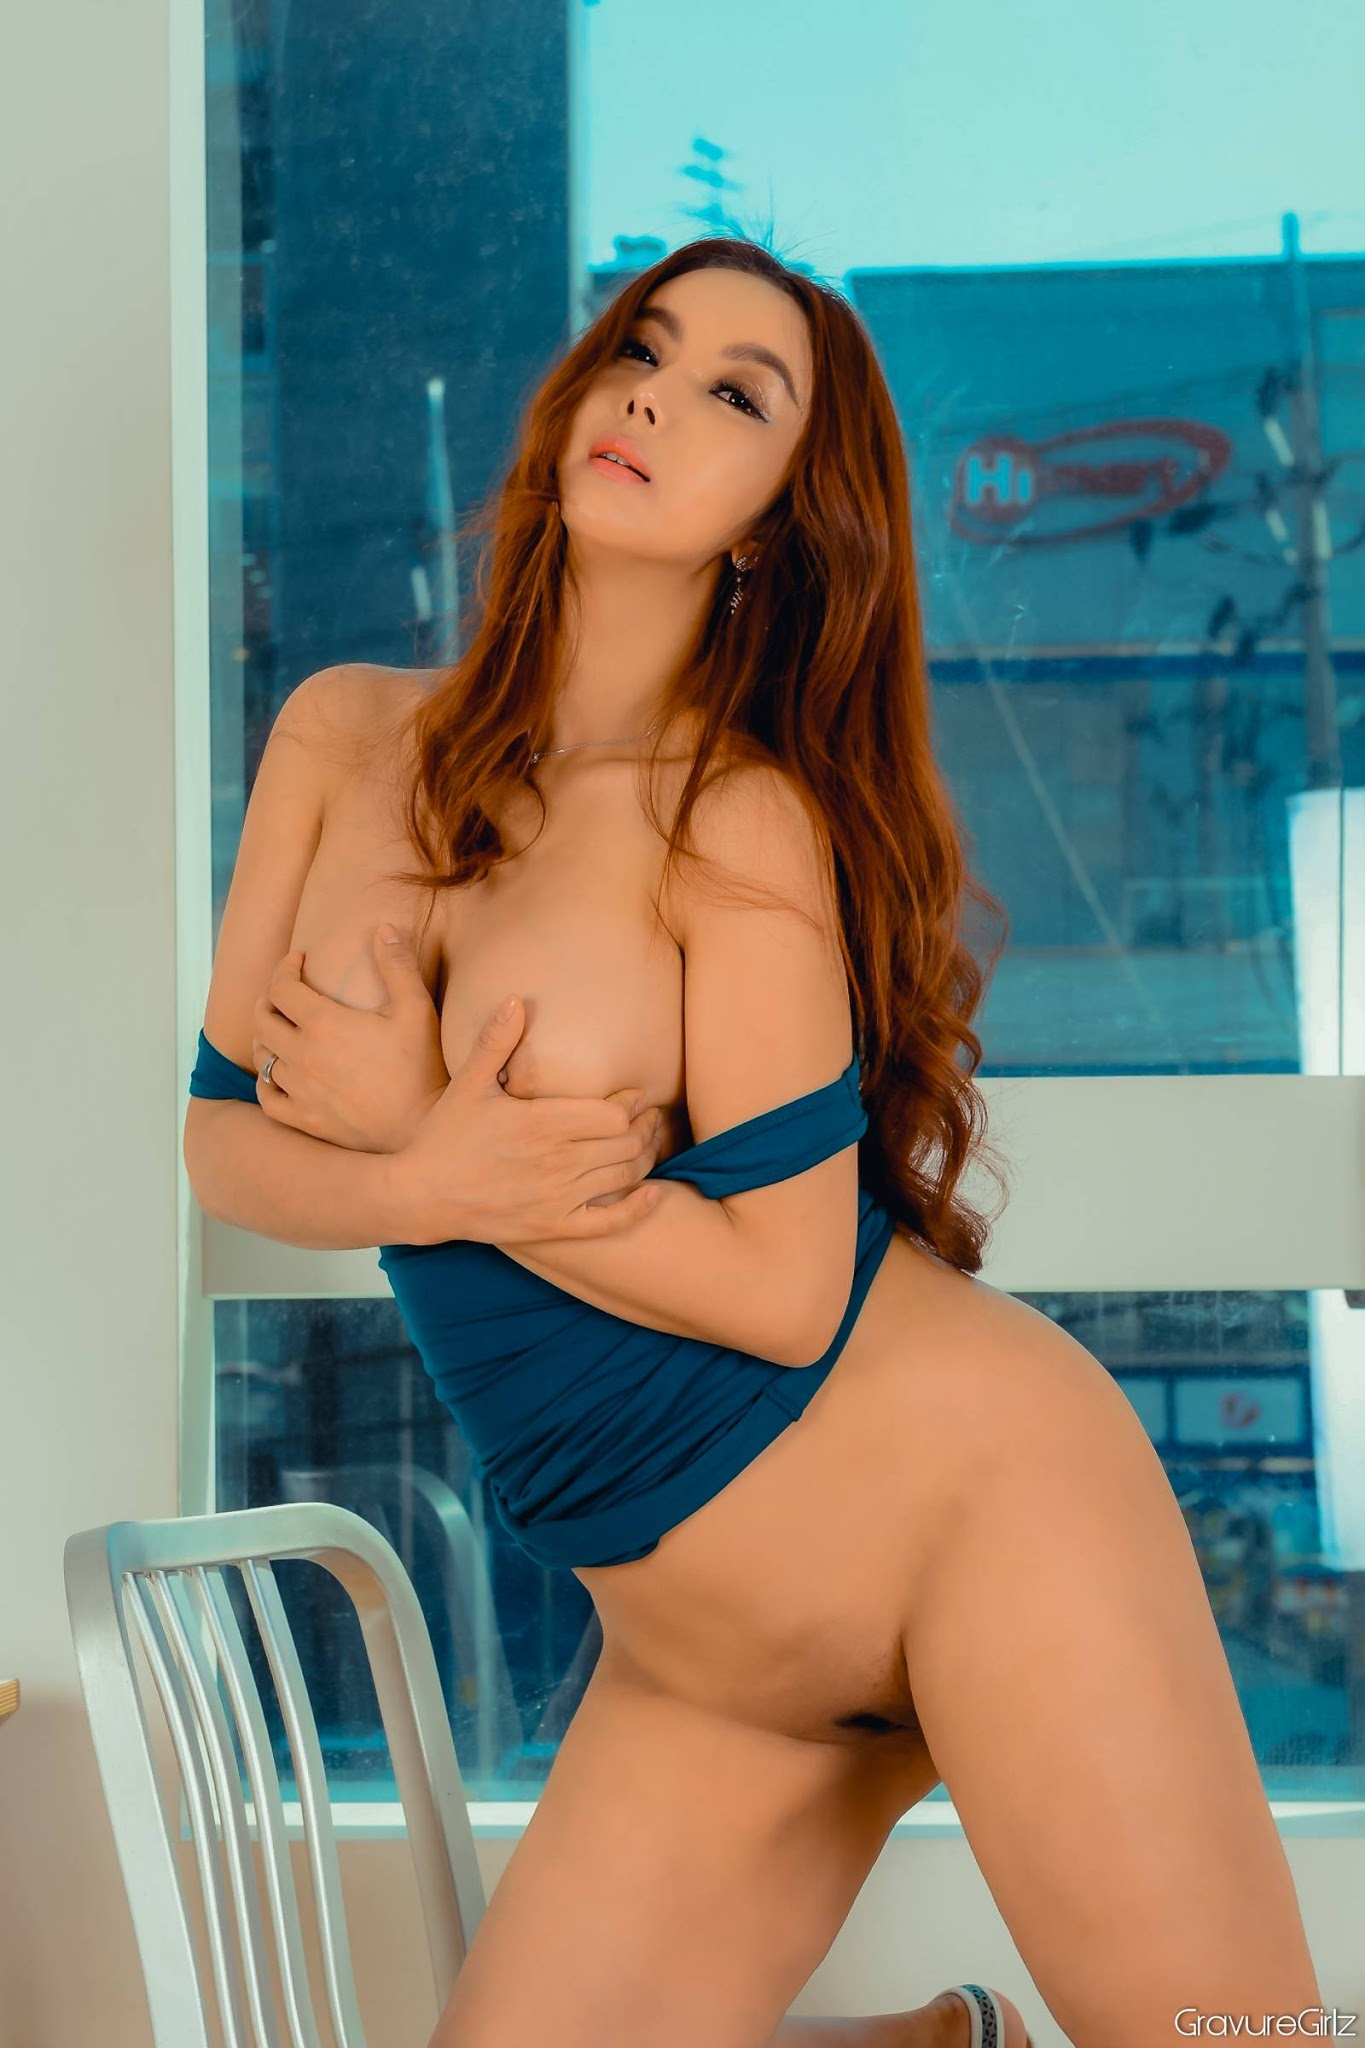 nude Girl uncensored model